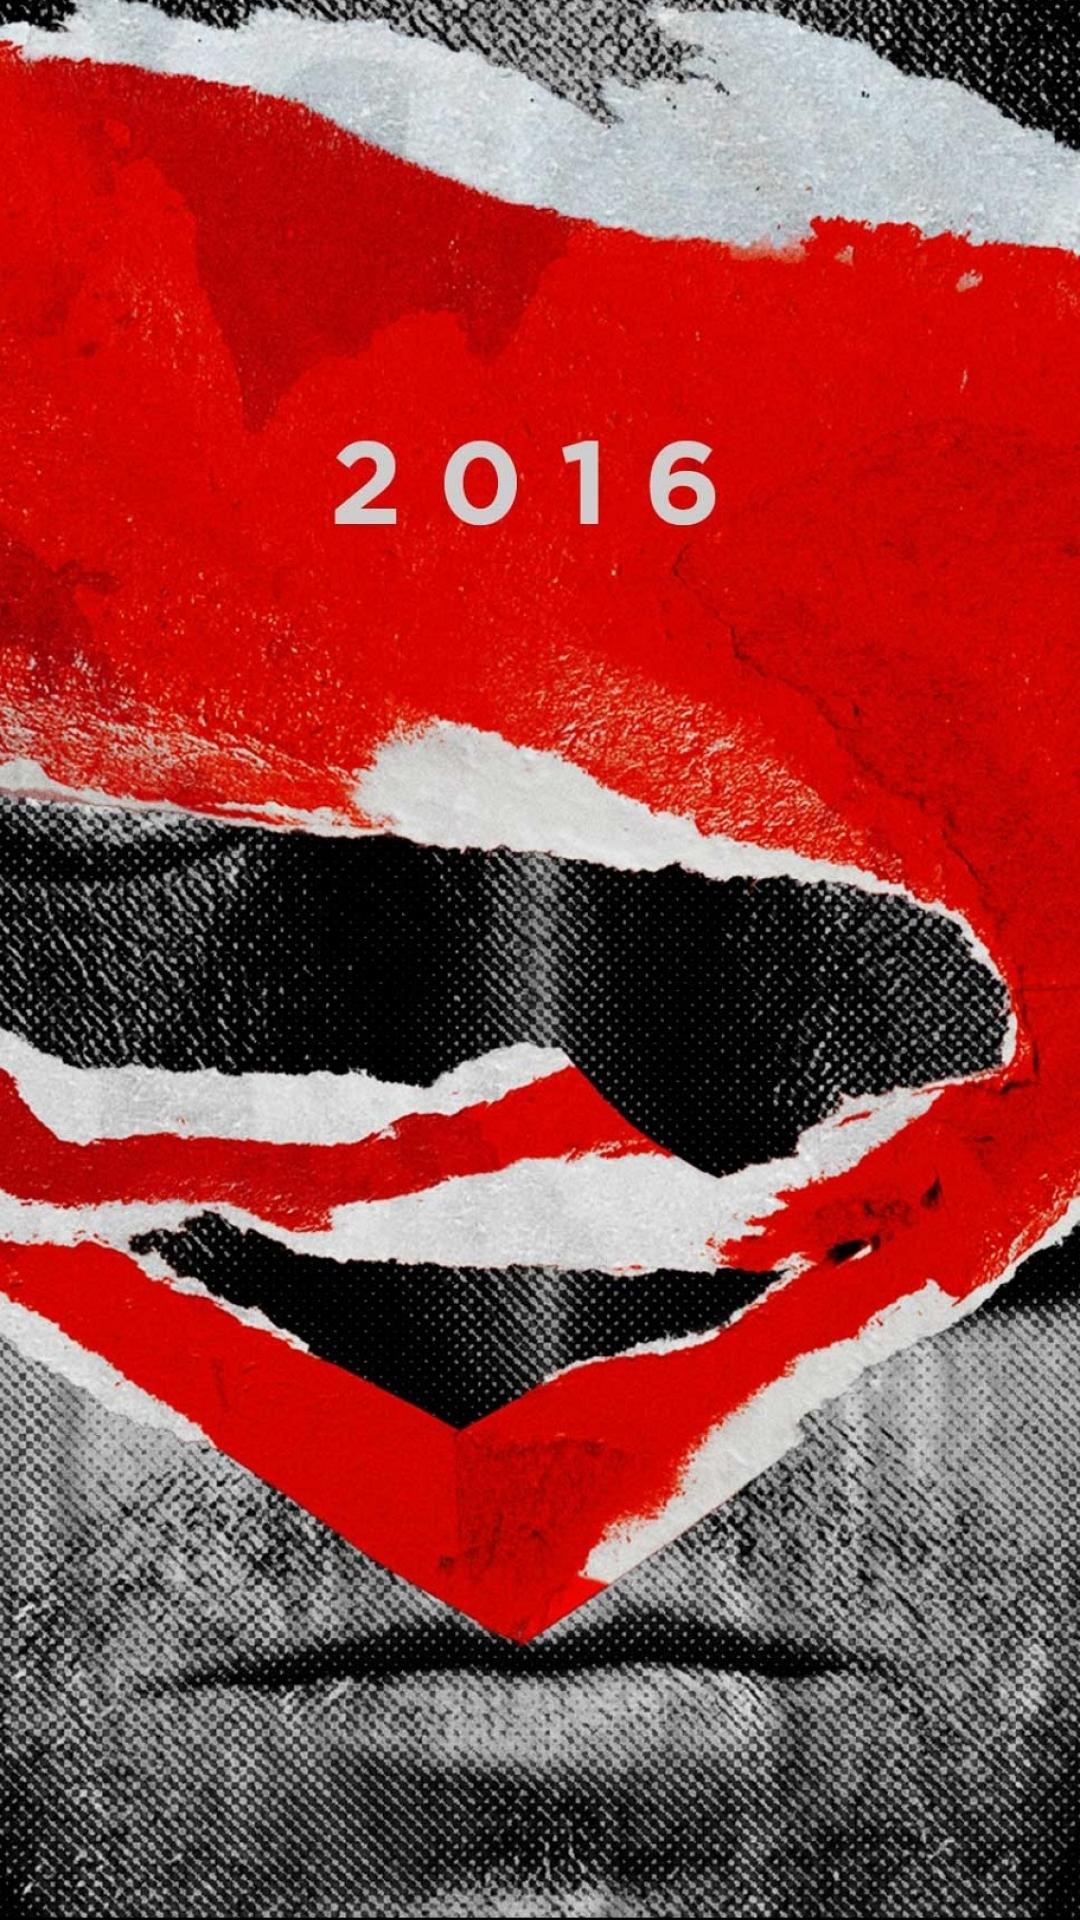 Moviebatman v superman dawn of justice 1080x1920 wallpaper id movie batman v superman dawn of justice 1080x1920 mobile wallpaper voltagebd Gallery